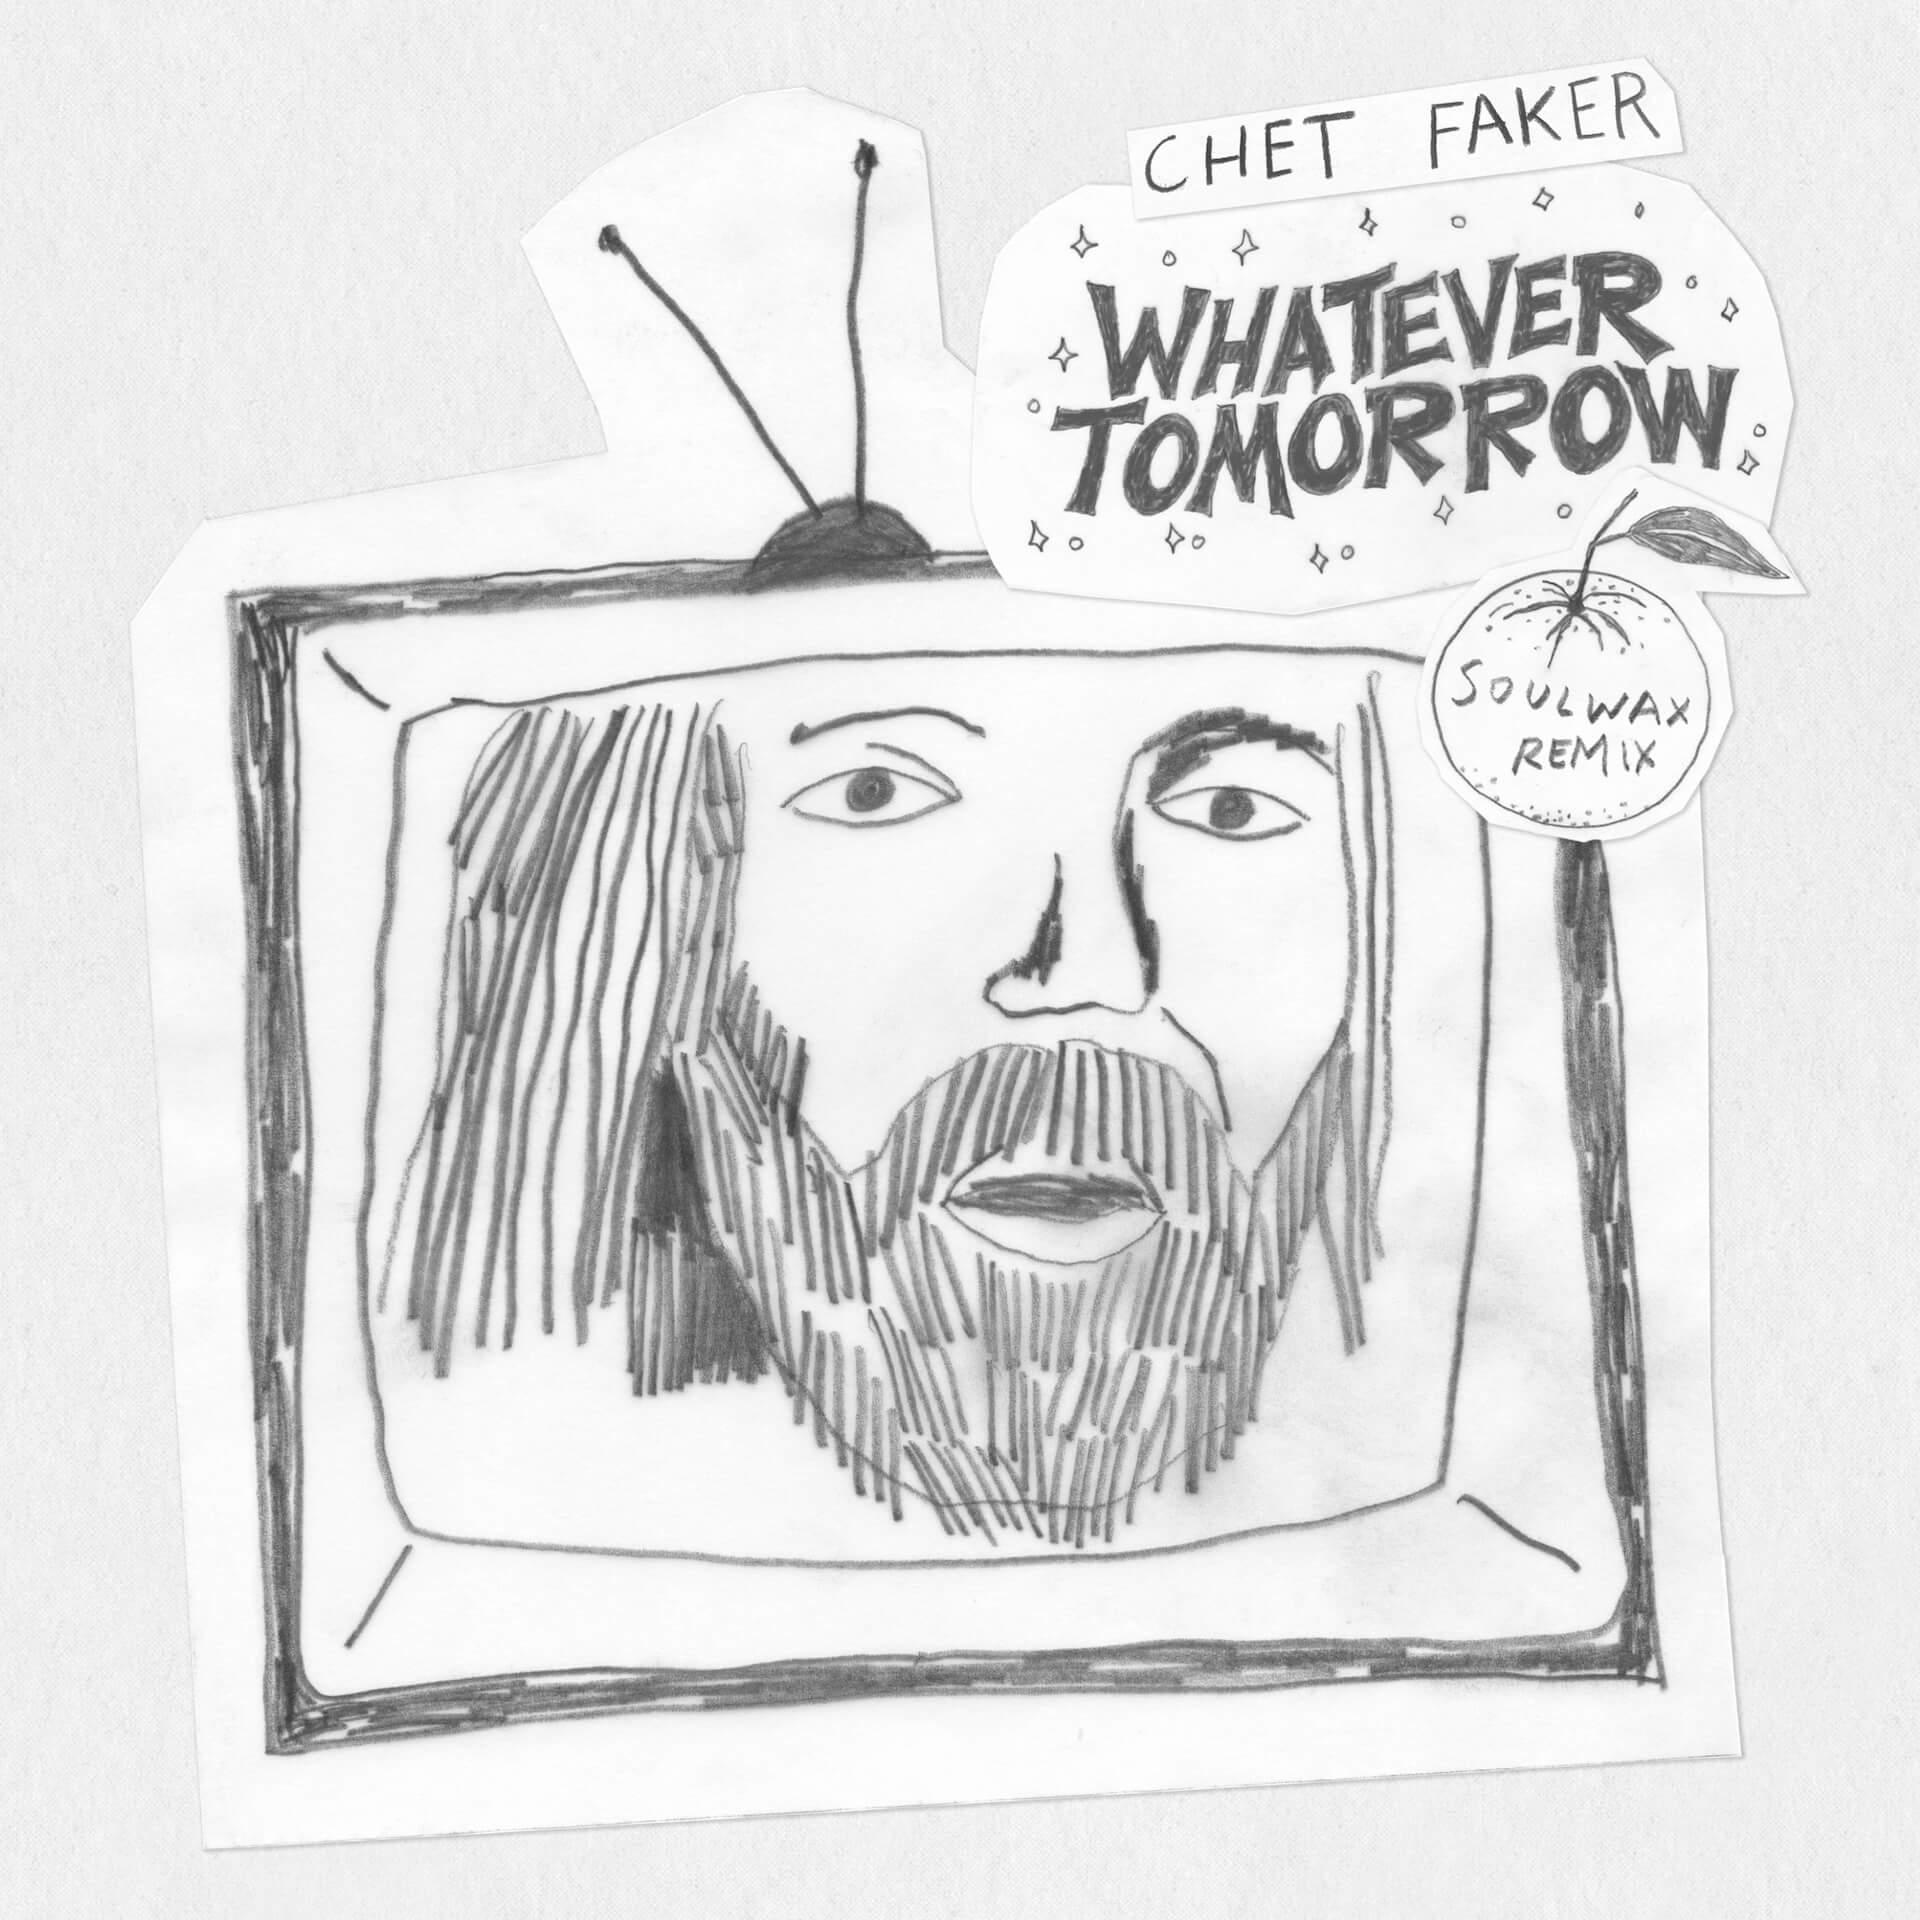 "Chet Fakerのニューアルバム『Hotel Surrender』収録の最新シングル""Whatever Tomorrow""をSoulwaxがリミックス! music210514_chetfaker-210514_2"